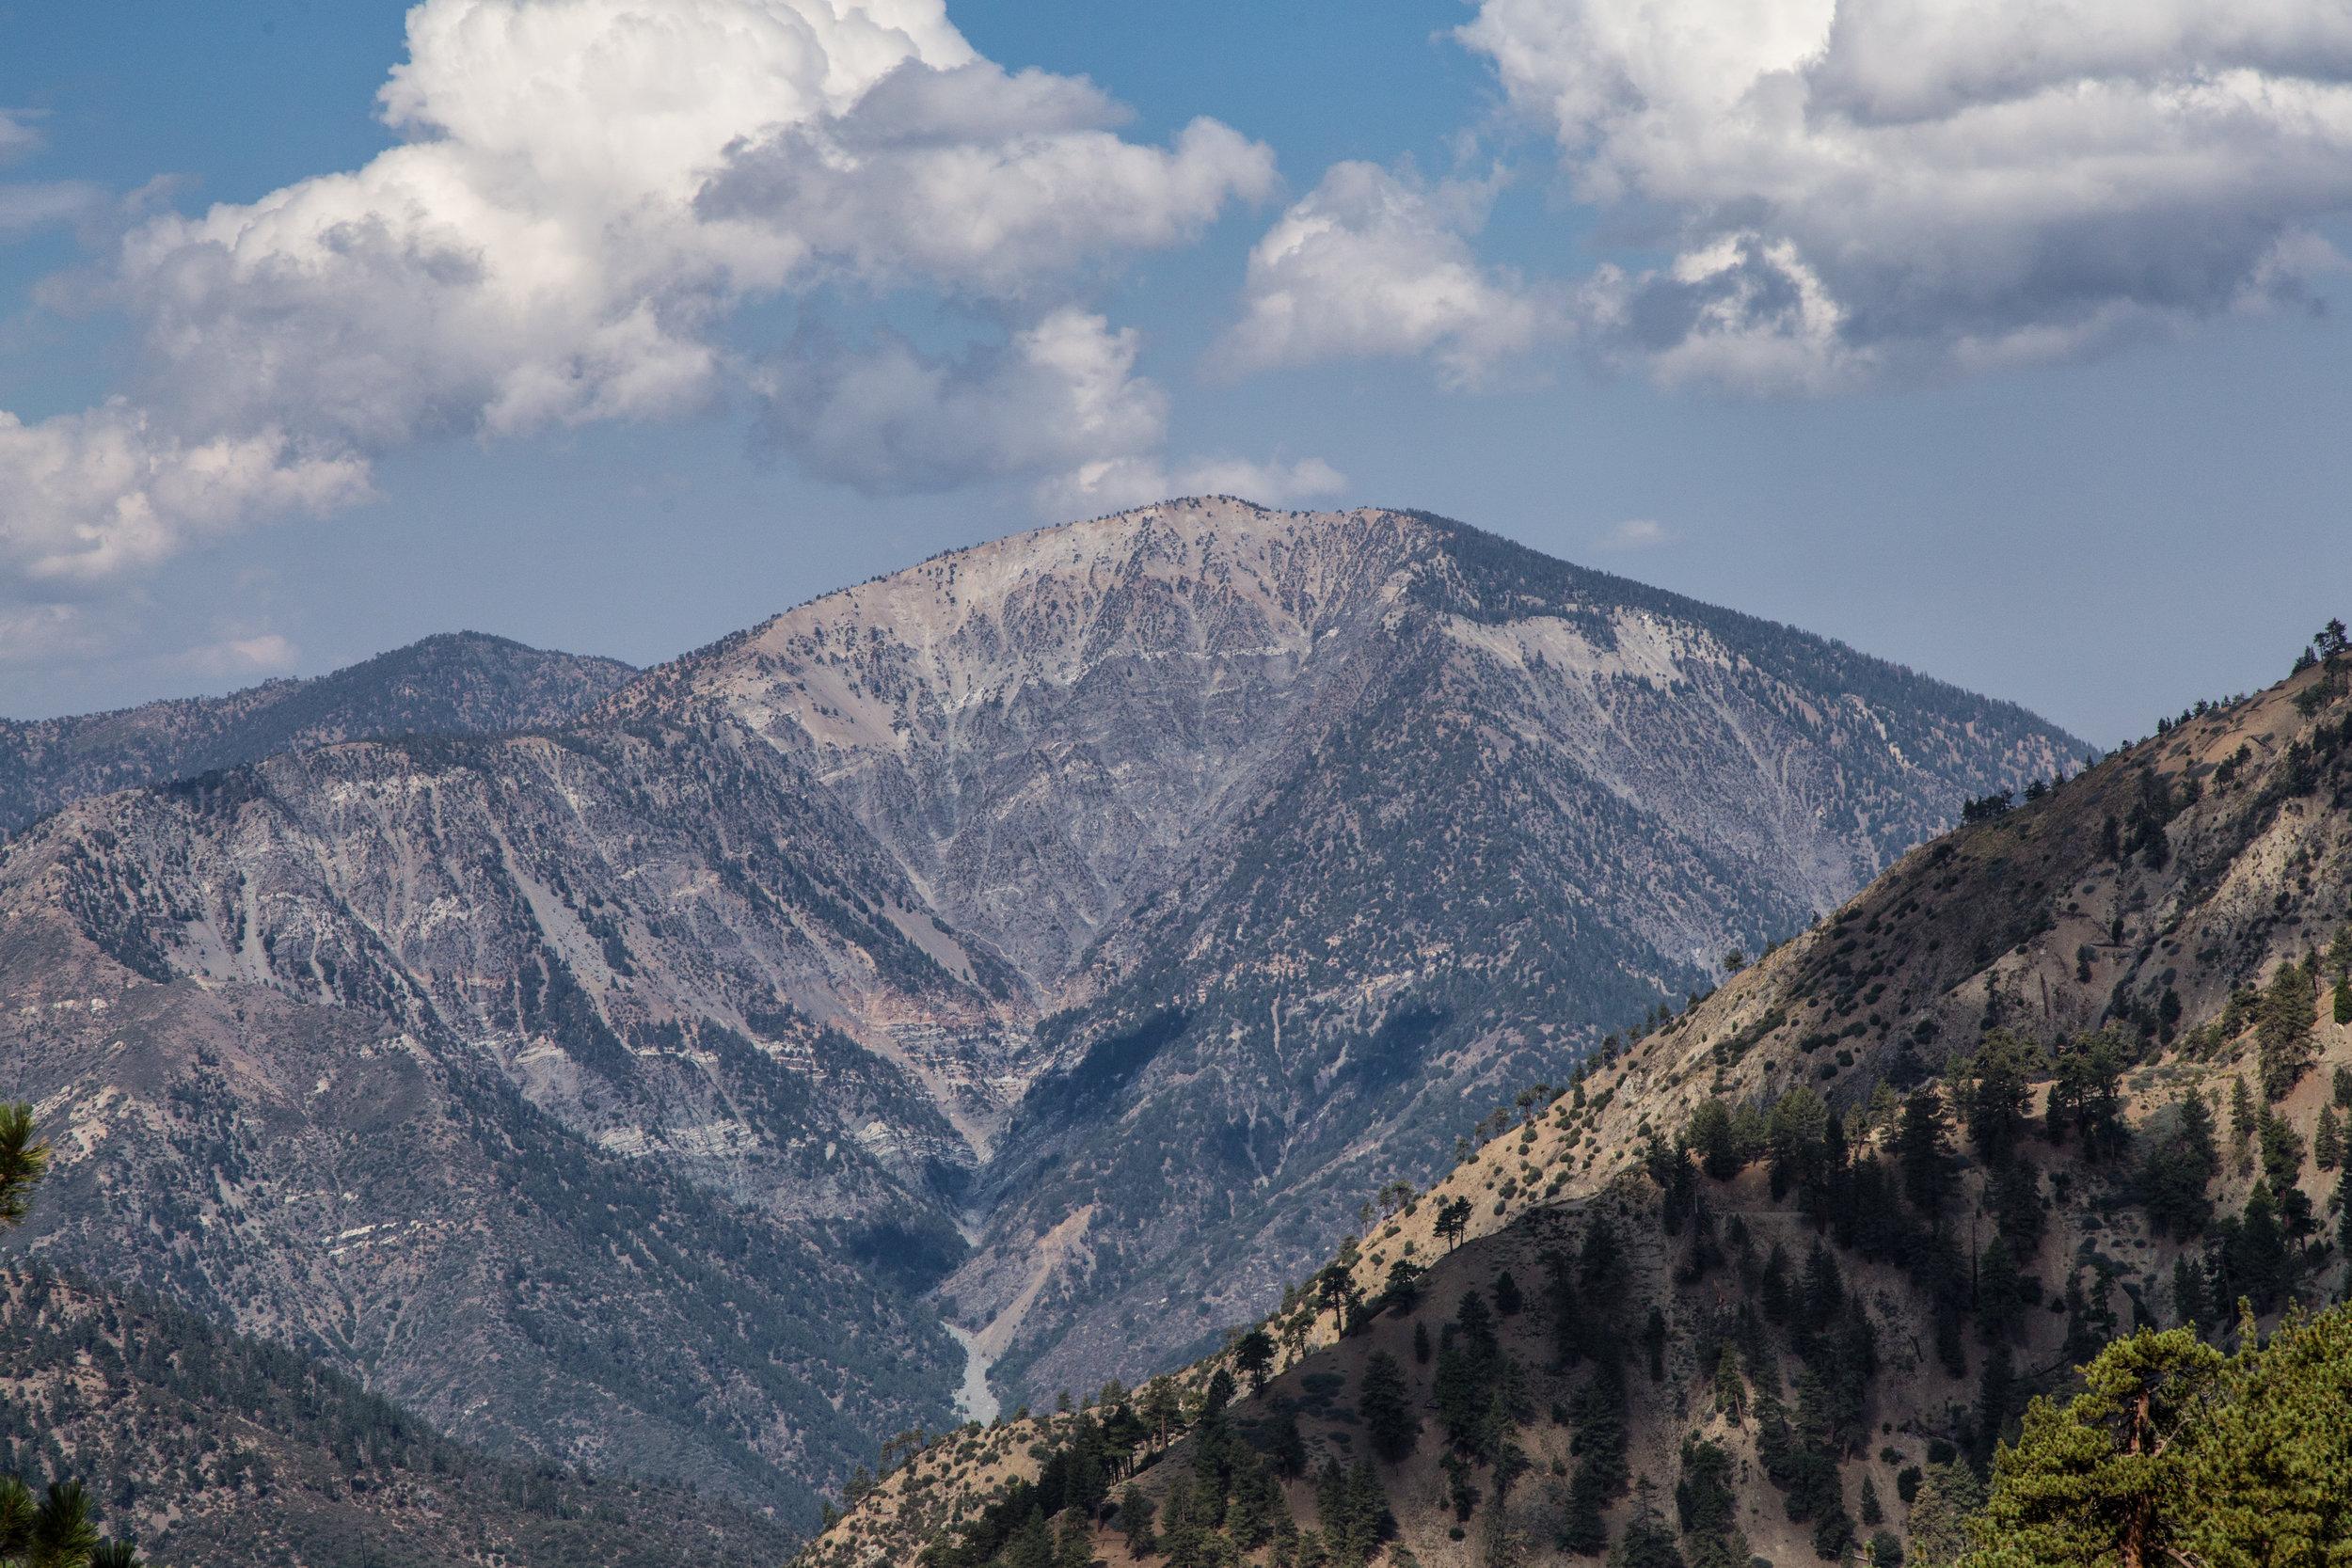 Enjoying the views of Mount San Antonio along the PCT.